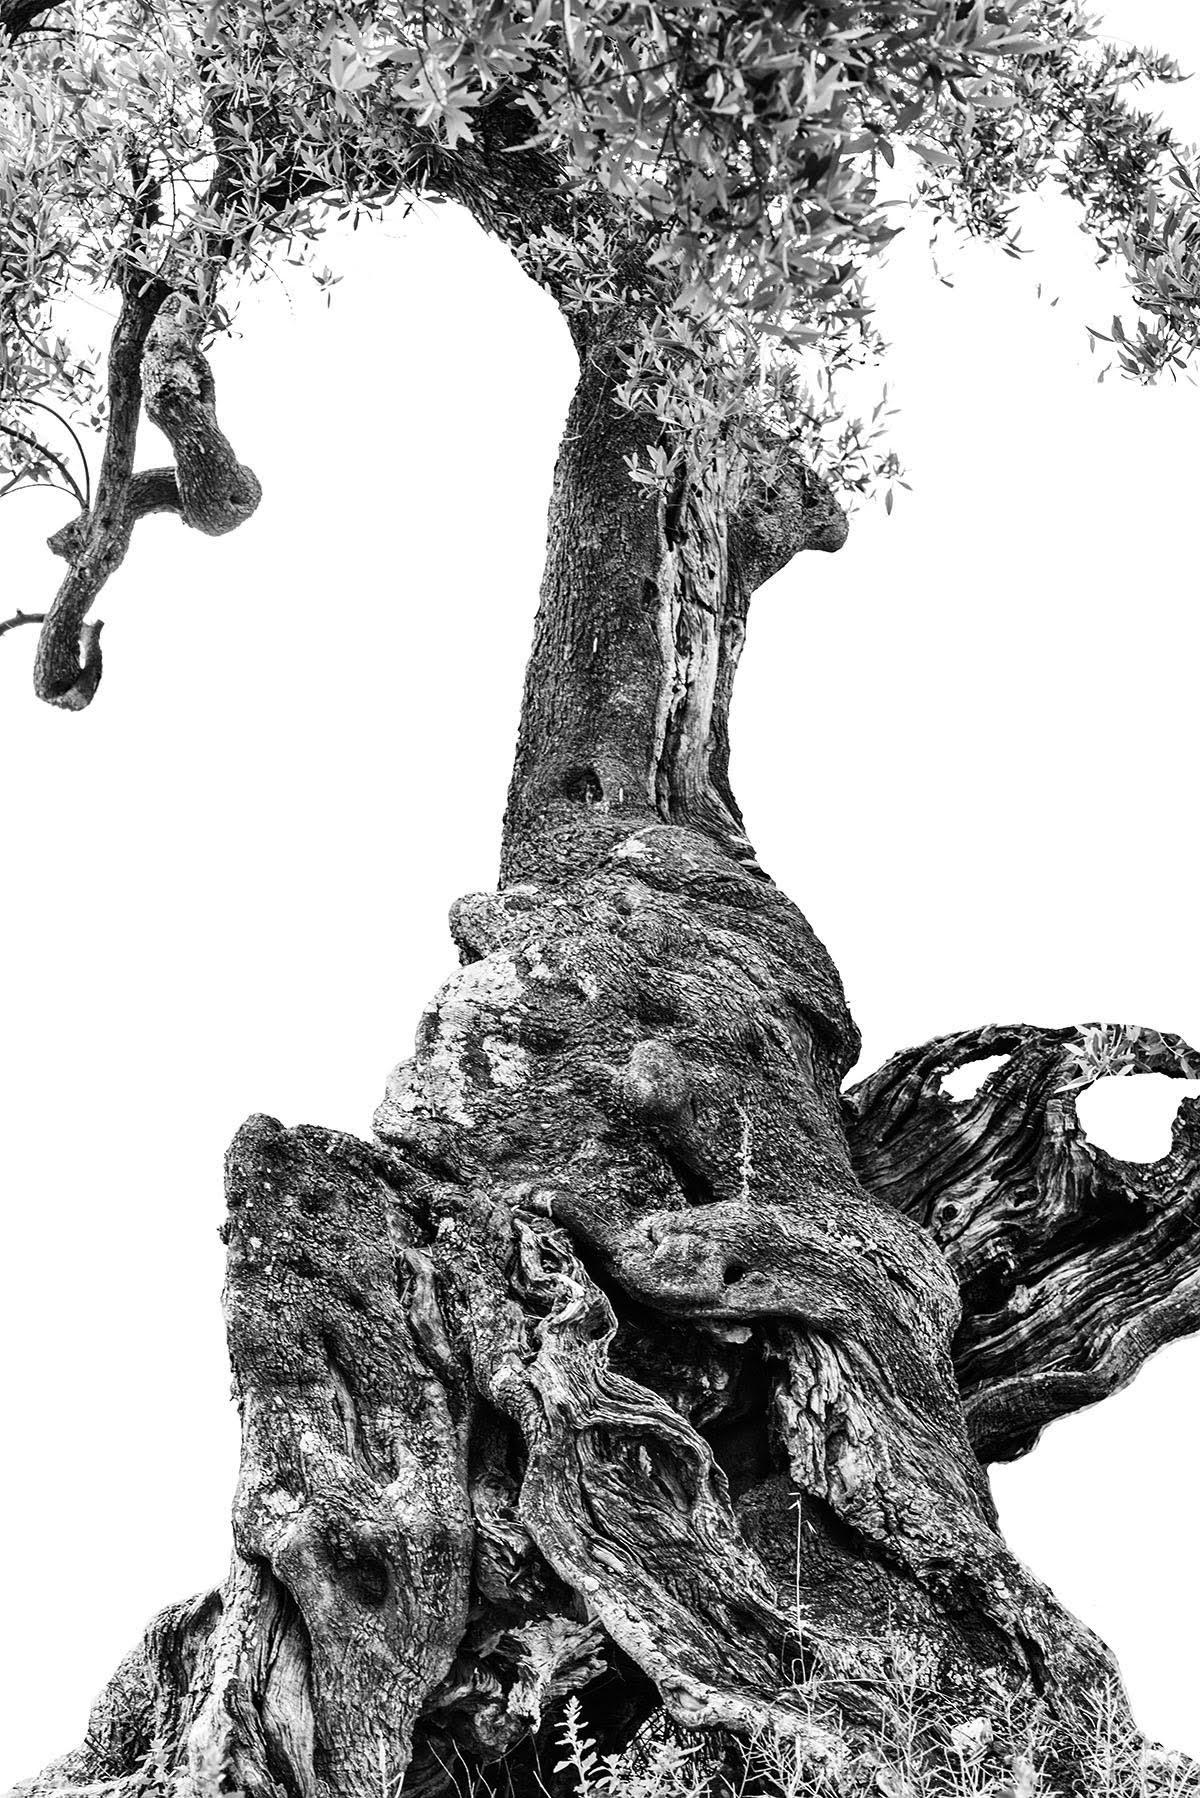 martin-ogolter-Monumentali-nature-landscape-photographer-11